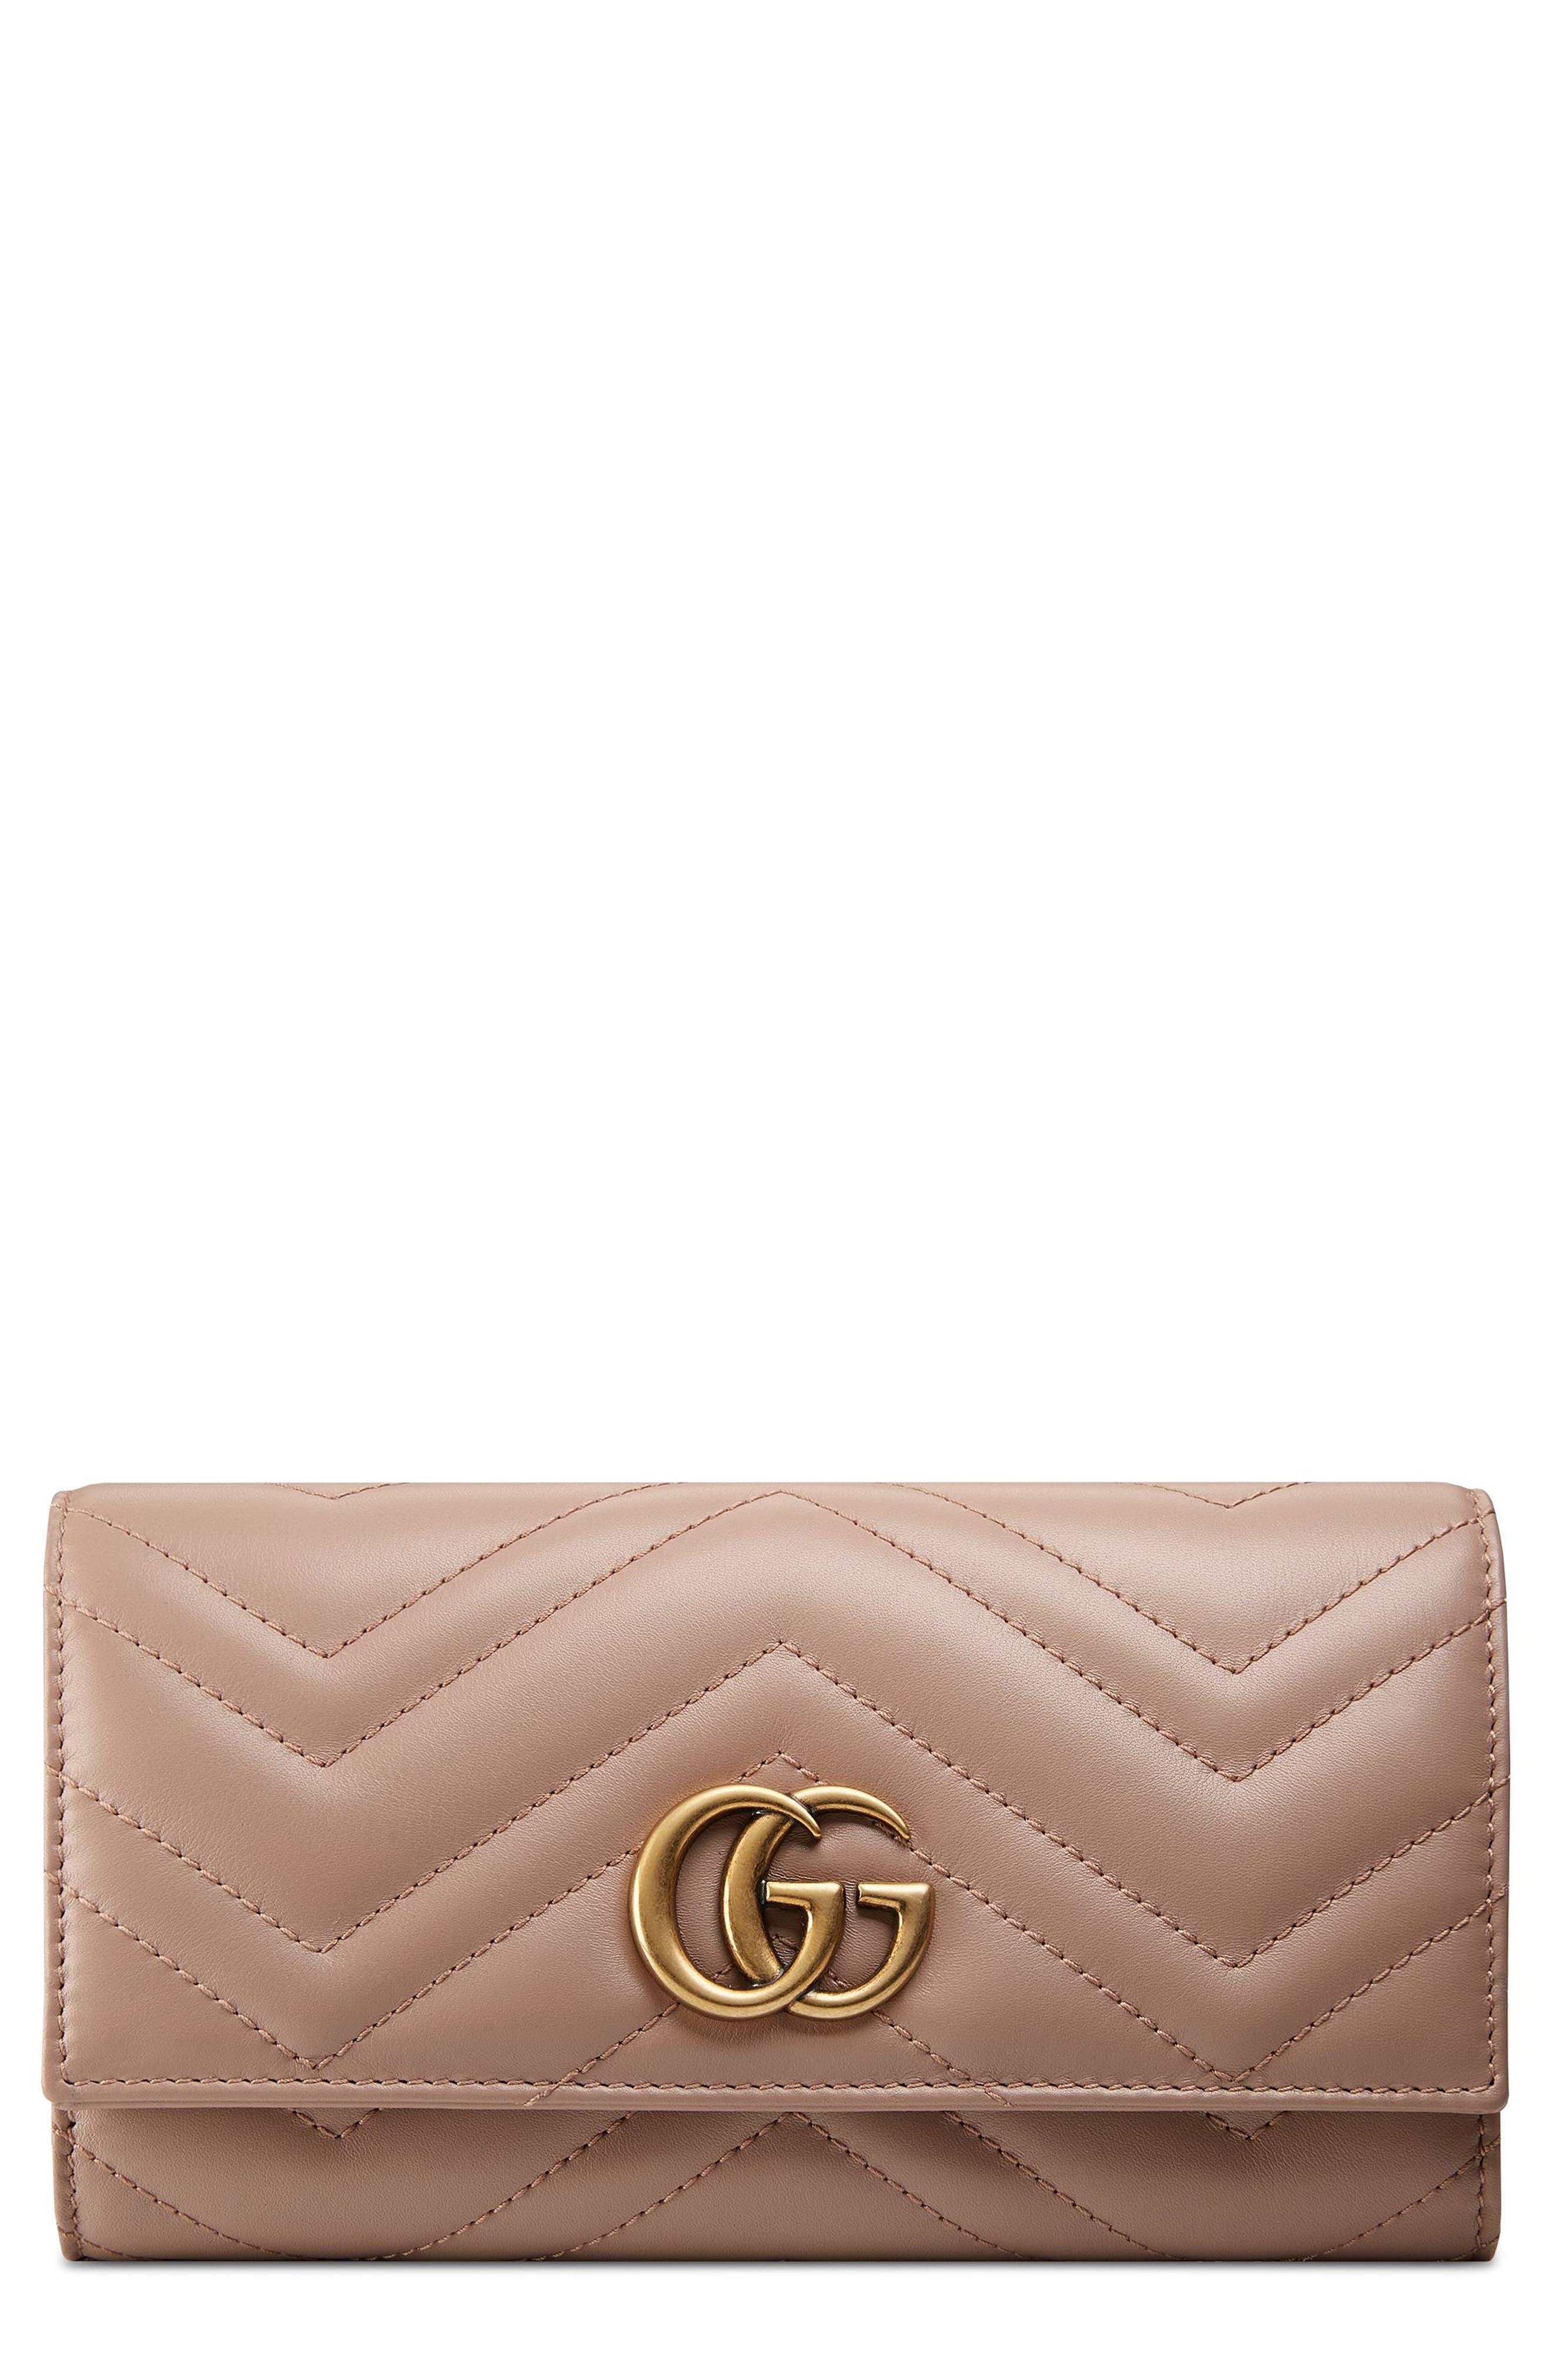 Main Image - Gucci GG Marmont Matelassé Leather Continental Wallet